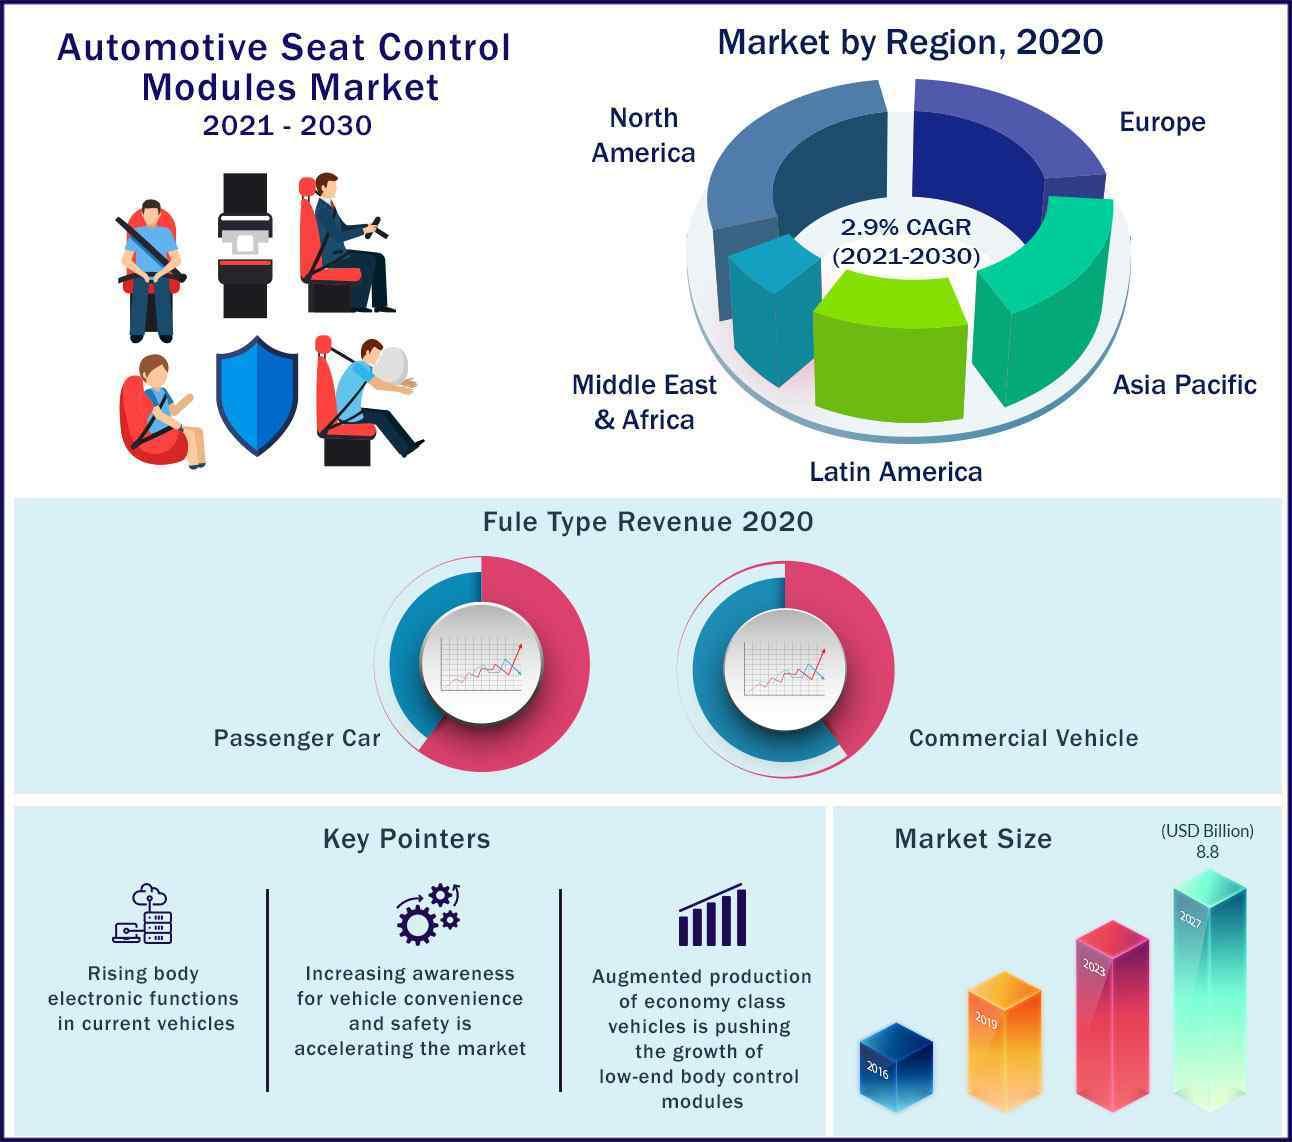 Global Automotive Seat Control Modules Market 2021-2030